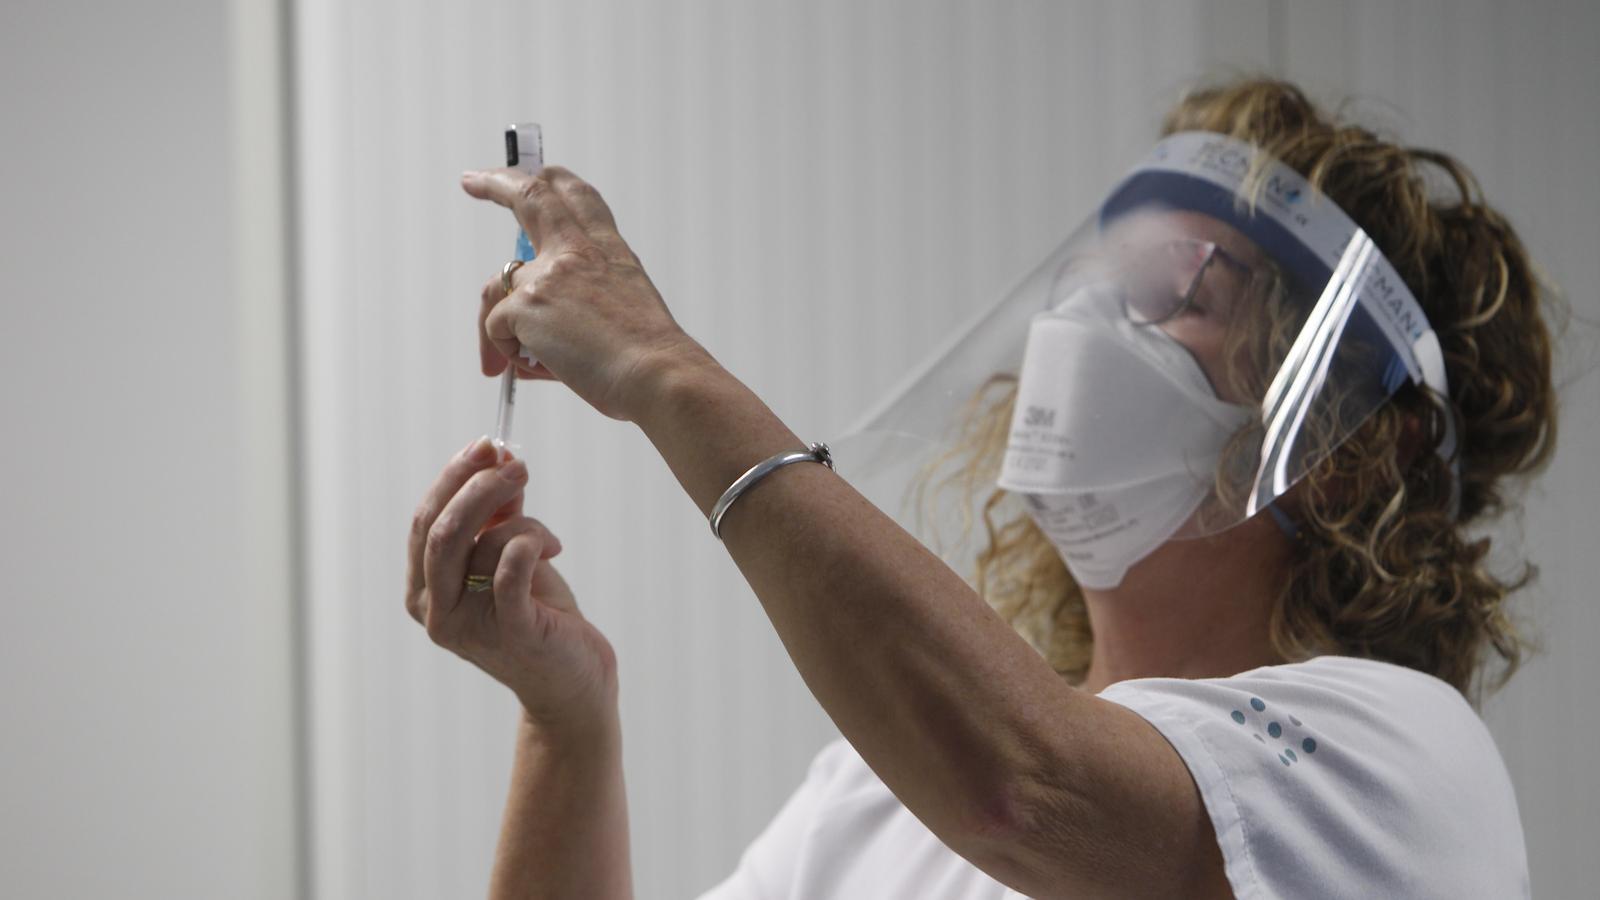 Una infermera prepara la vacuna de Pfizer per administrar-la a un sanitari de Son Espases.